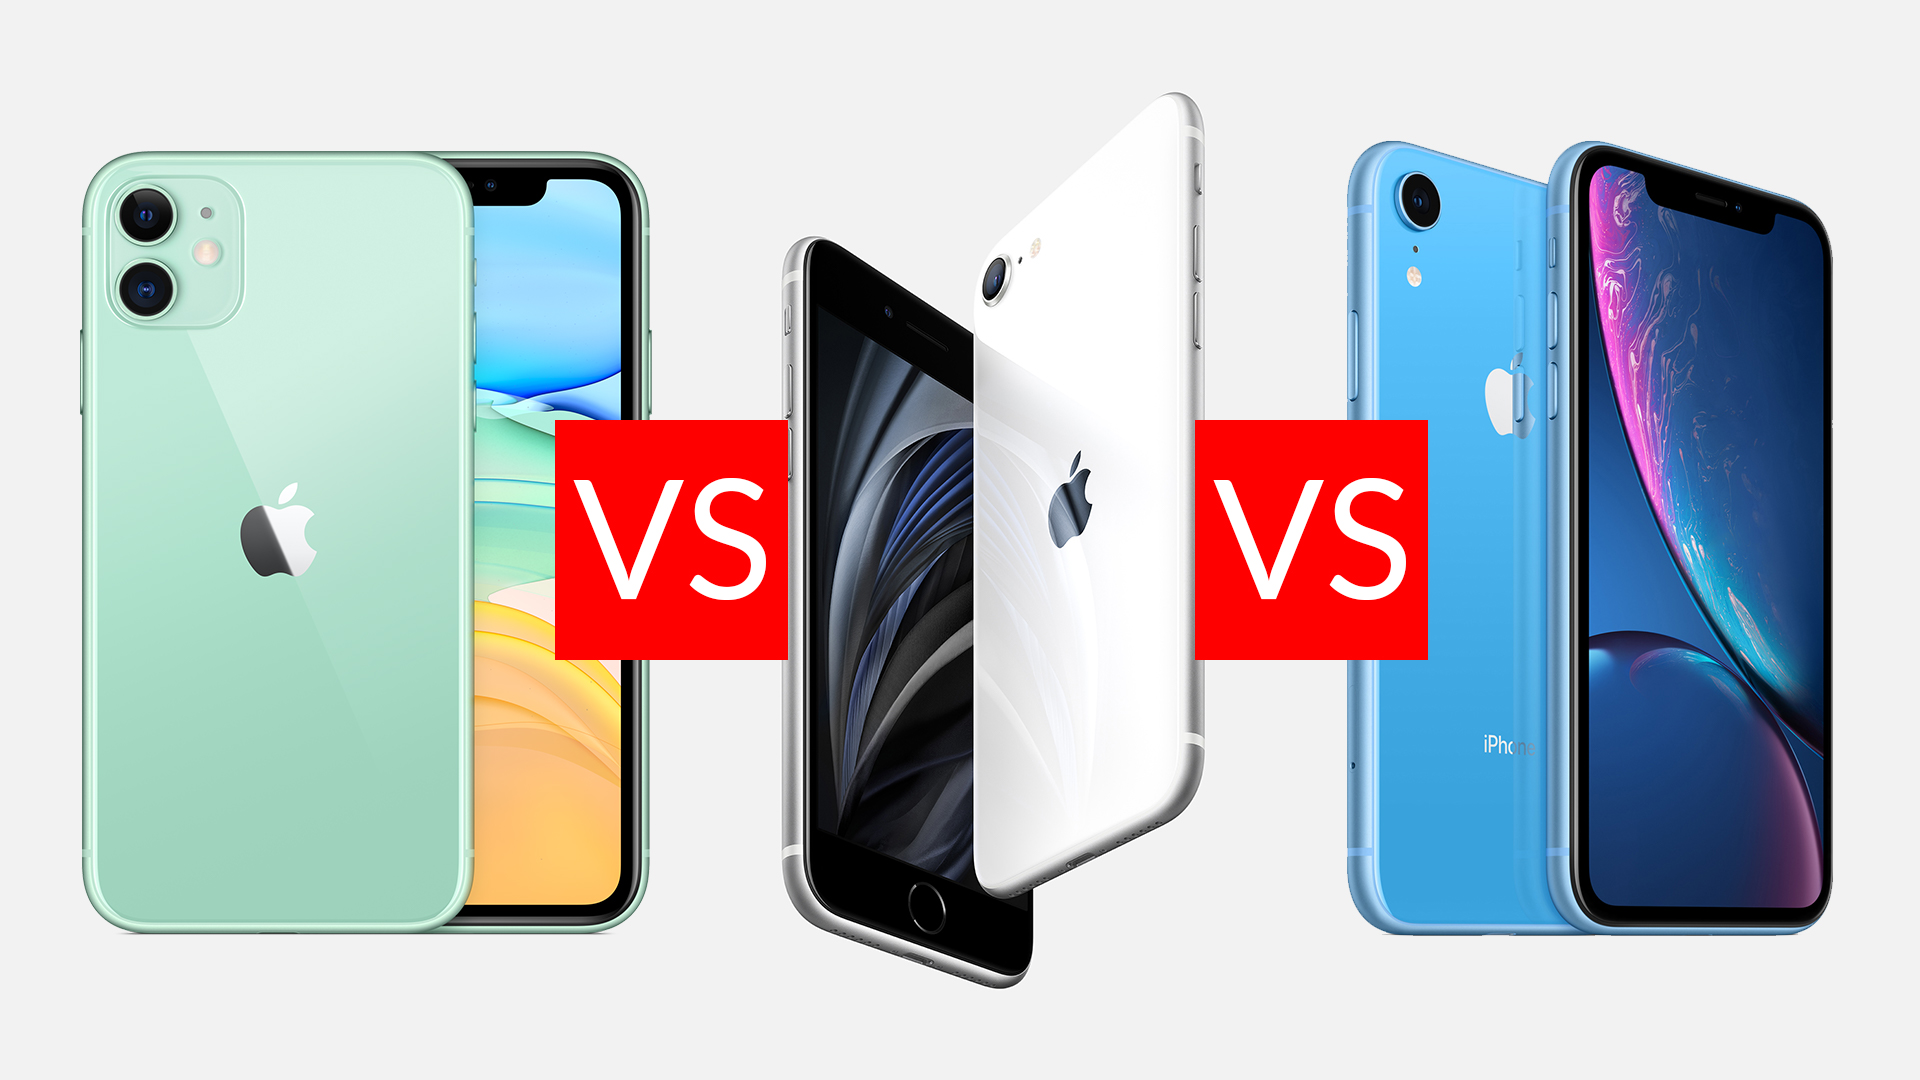 iPhone SE vs iPhone 11 Vs iPhone XR Camera Comparison